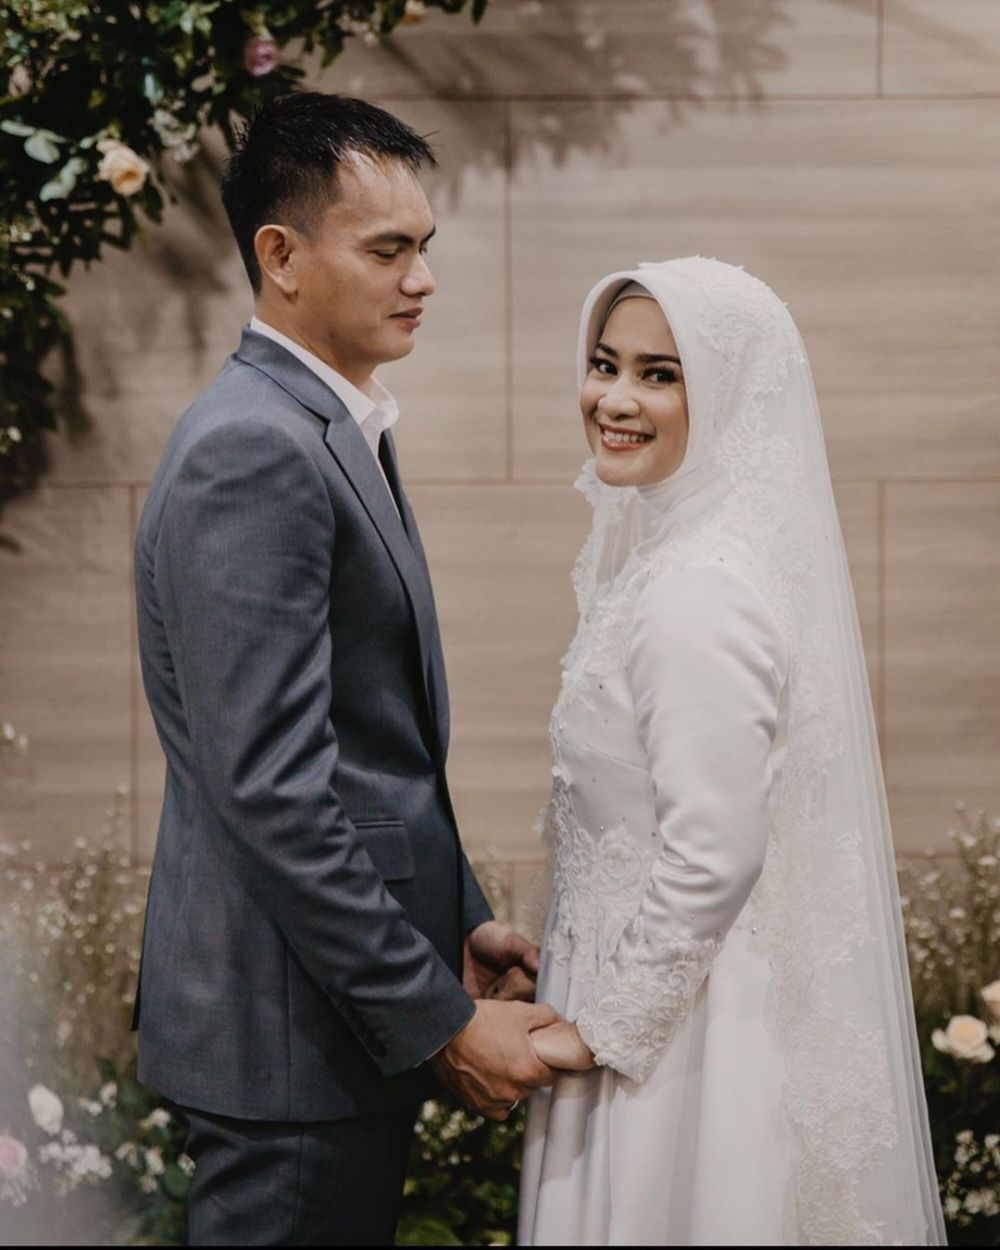 Momen pernikahan Ikke Nurjanah dan Karlie Fu Instagram© 2021 brilio.net